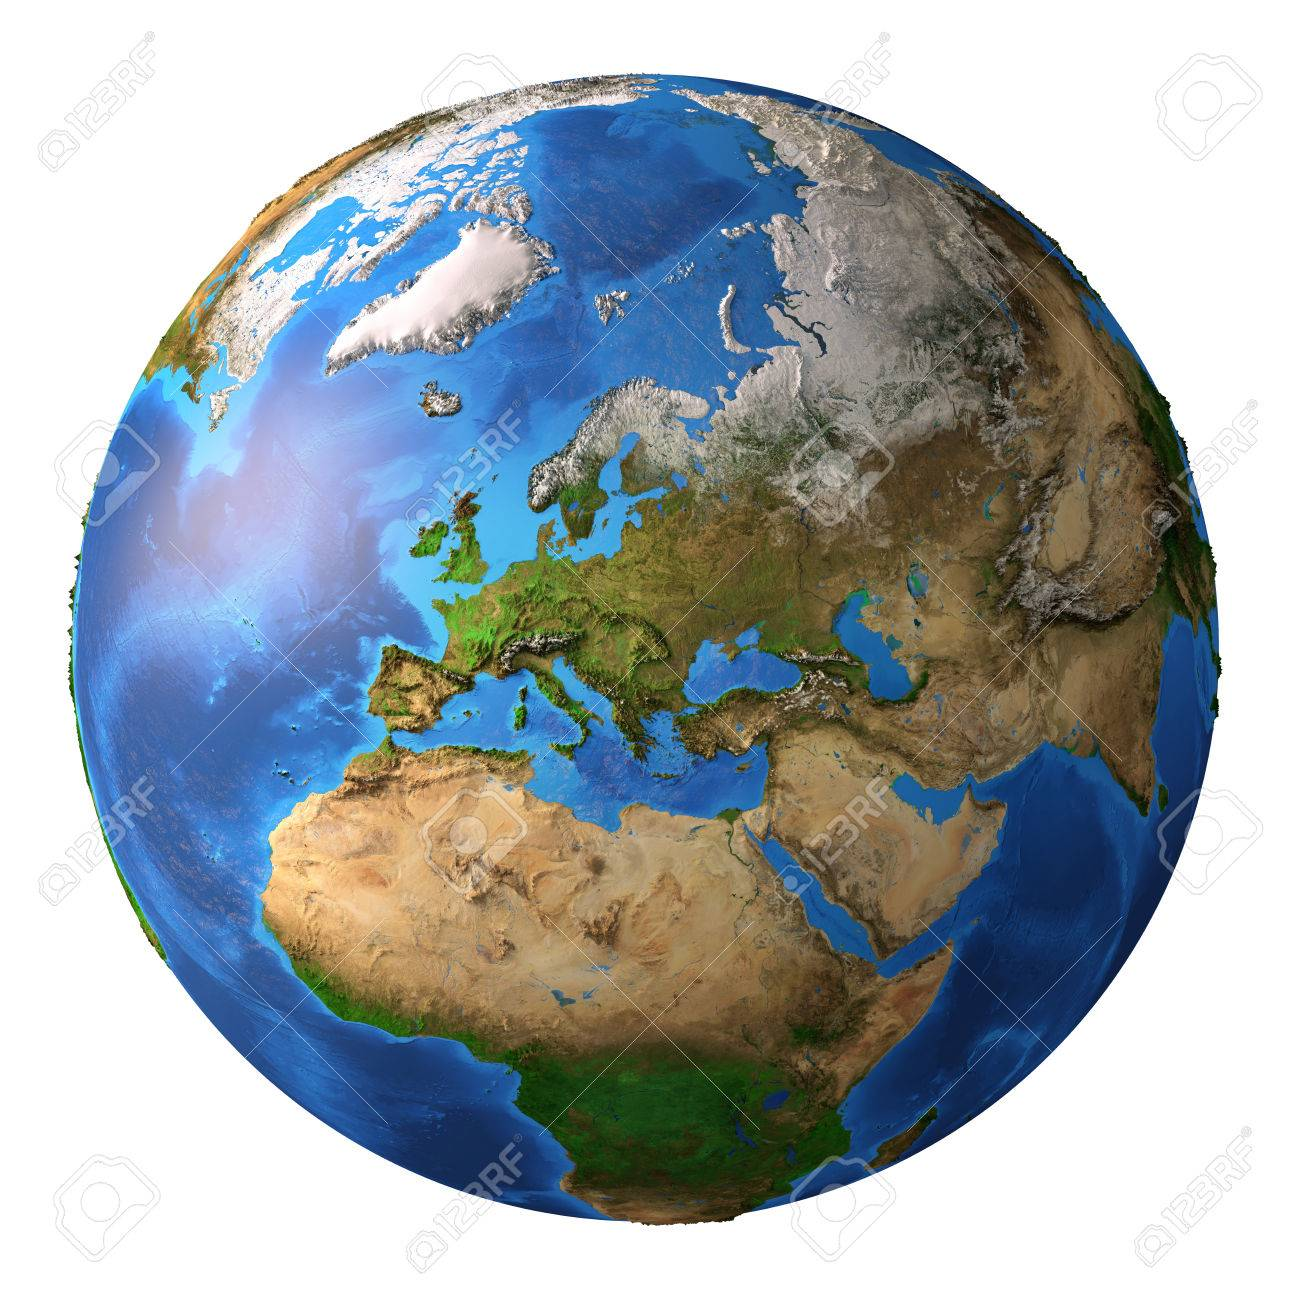 planete-terre - Photo